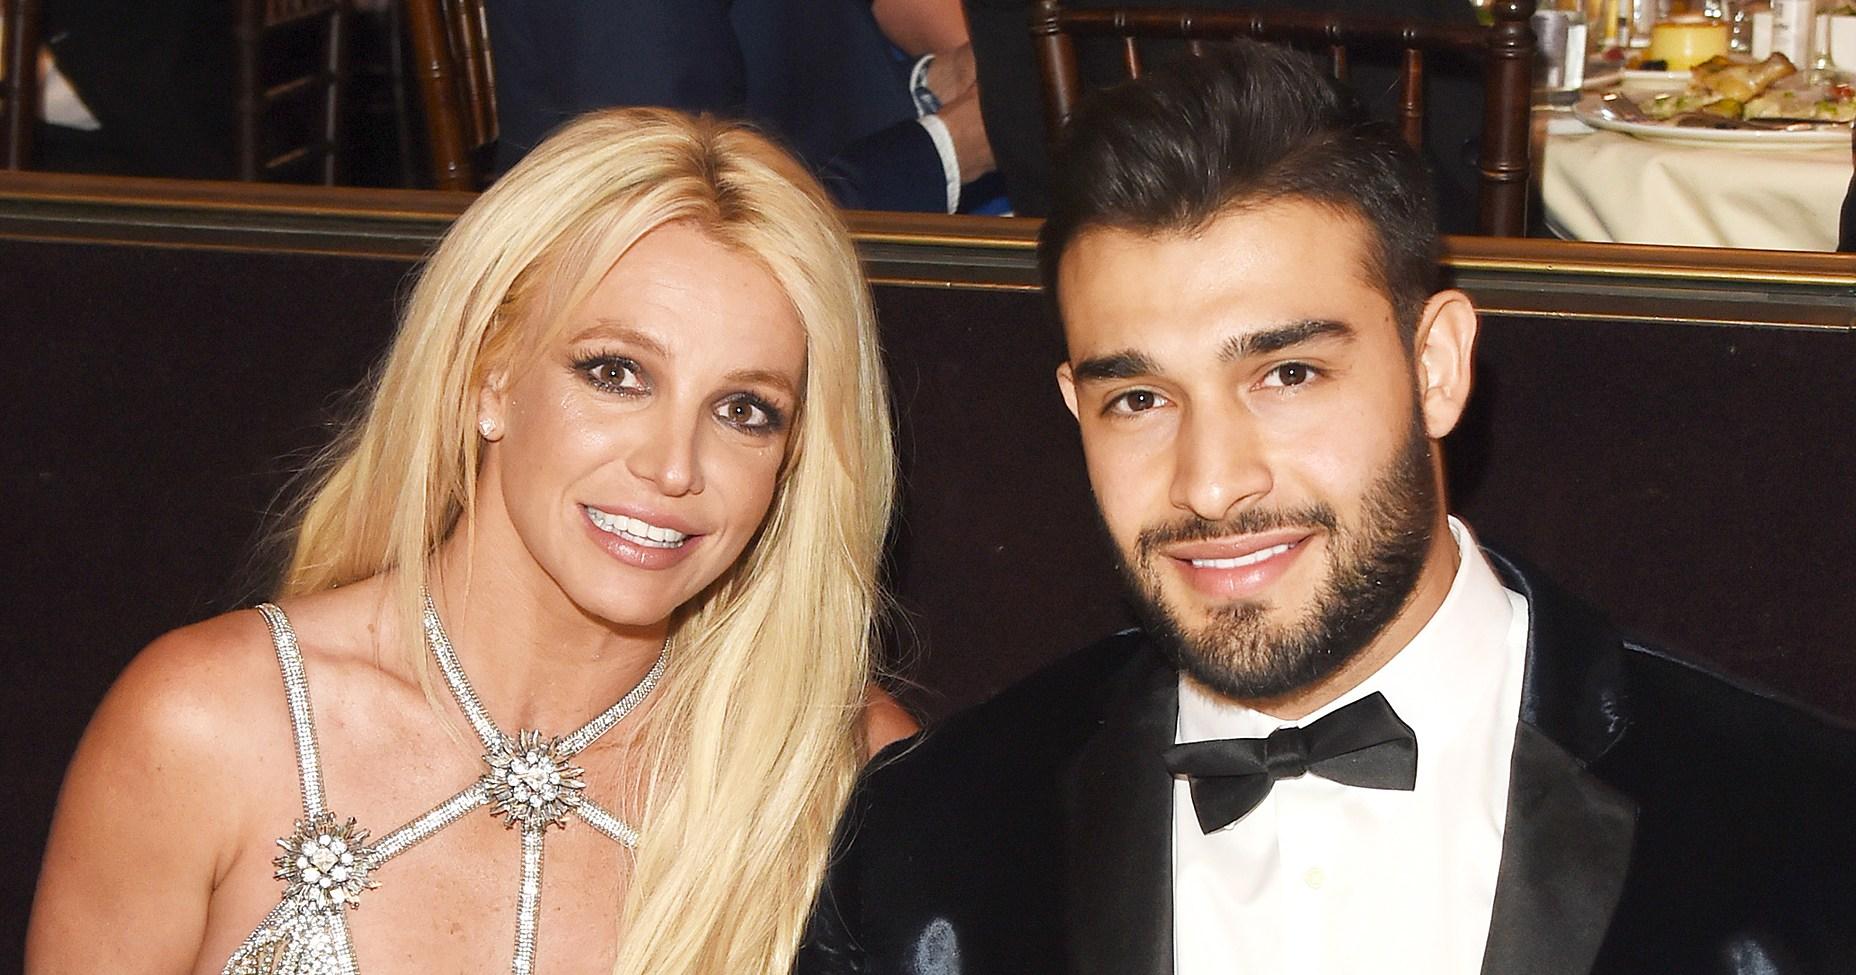 Britney Spears and Boyfriend Sam Asghari Flaunt Their Amazing Bodies, Chemistry in Impressive Workout Video